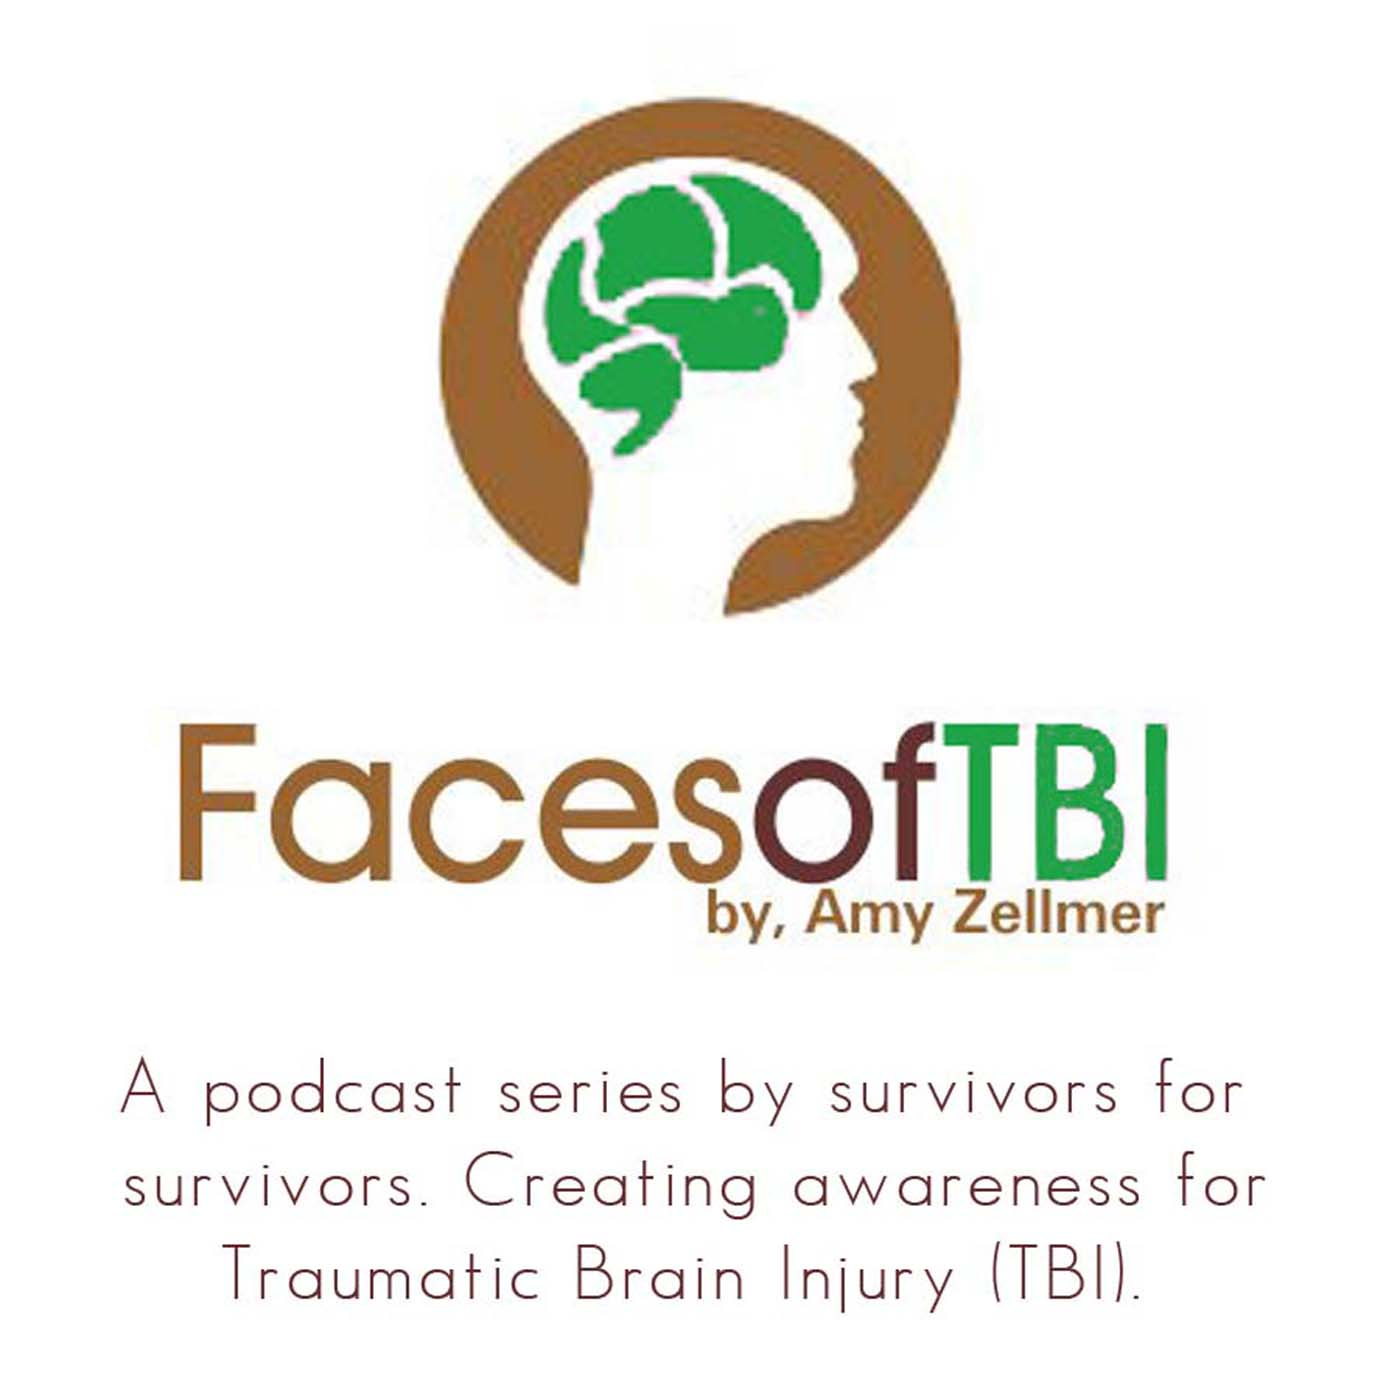 TBI, traumatic brain injury, abi, brain injury, stroke, awareness, concussion